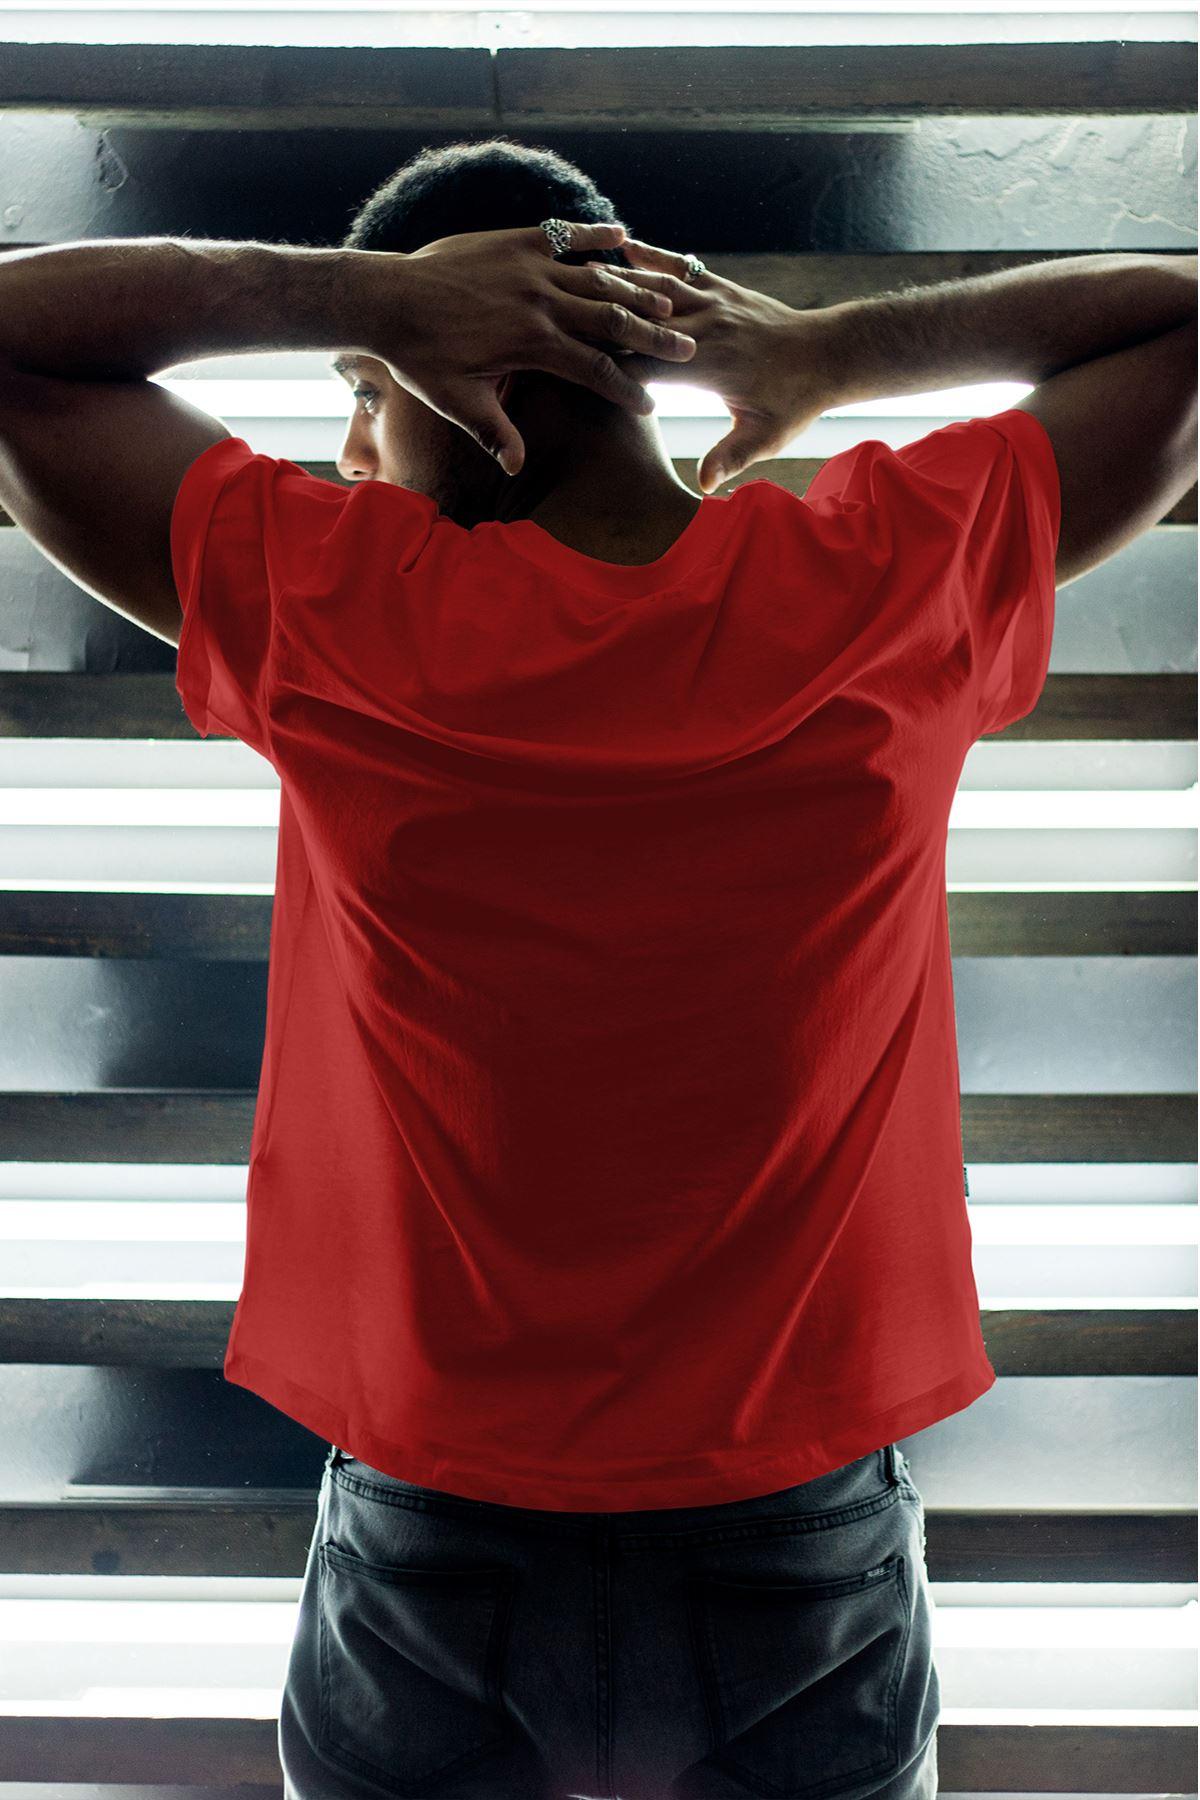 Boston Celtics 27 Kırmızı Erkek Oversize Tshirt - Tişört